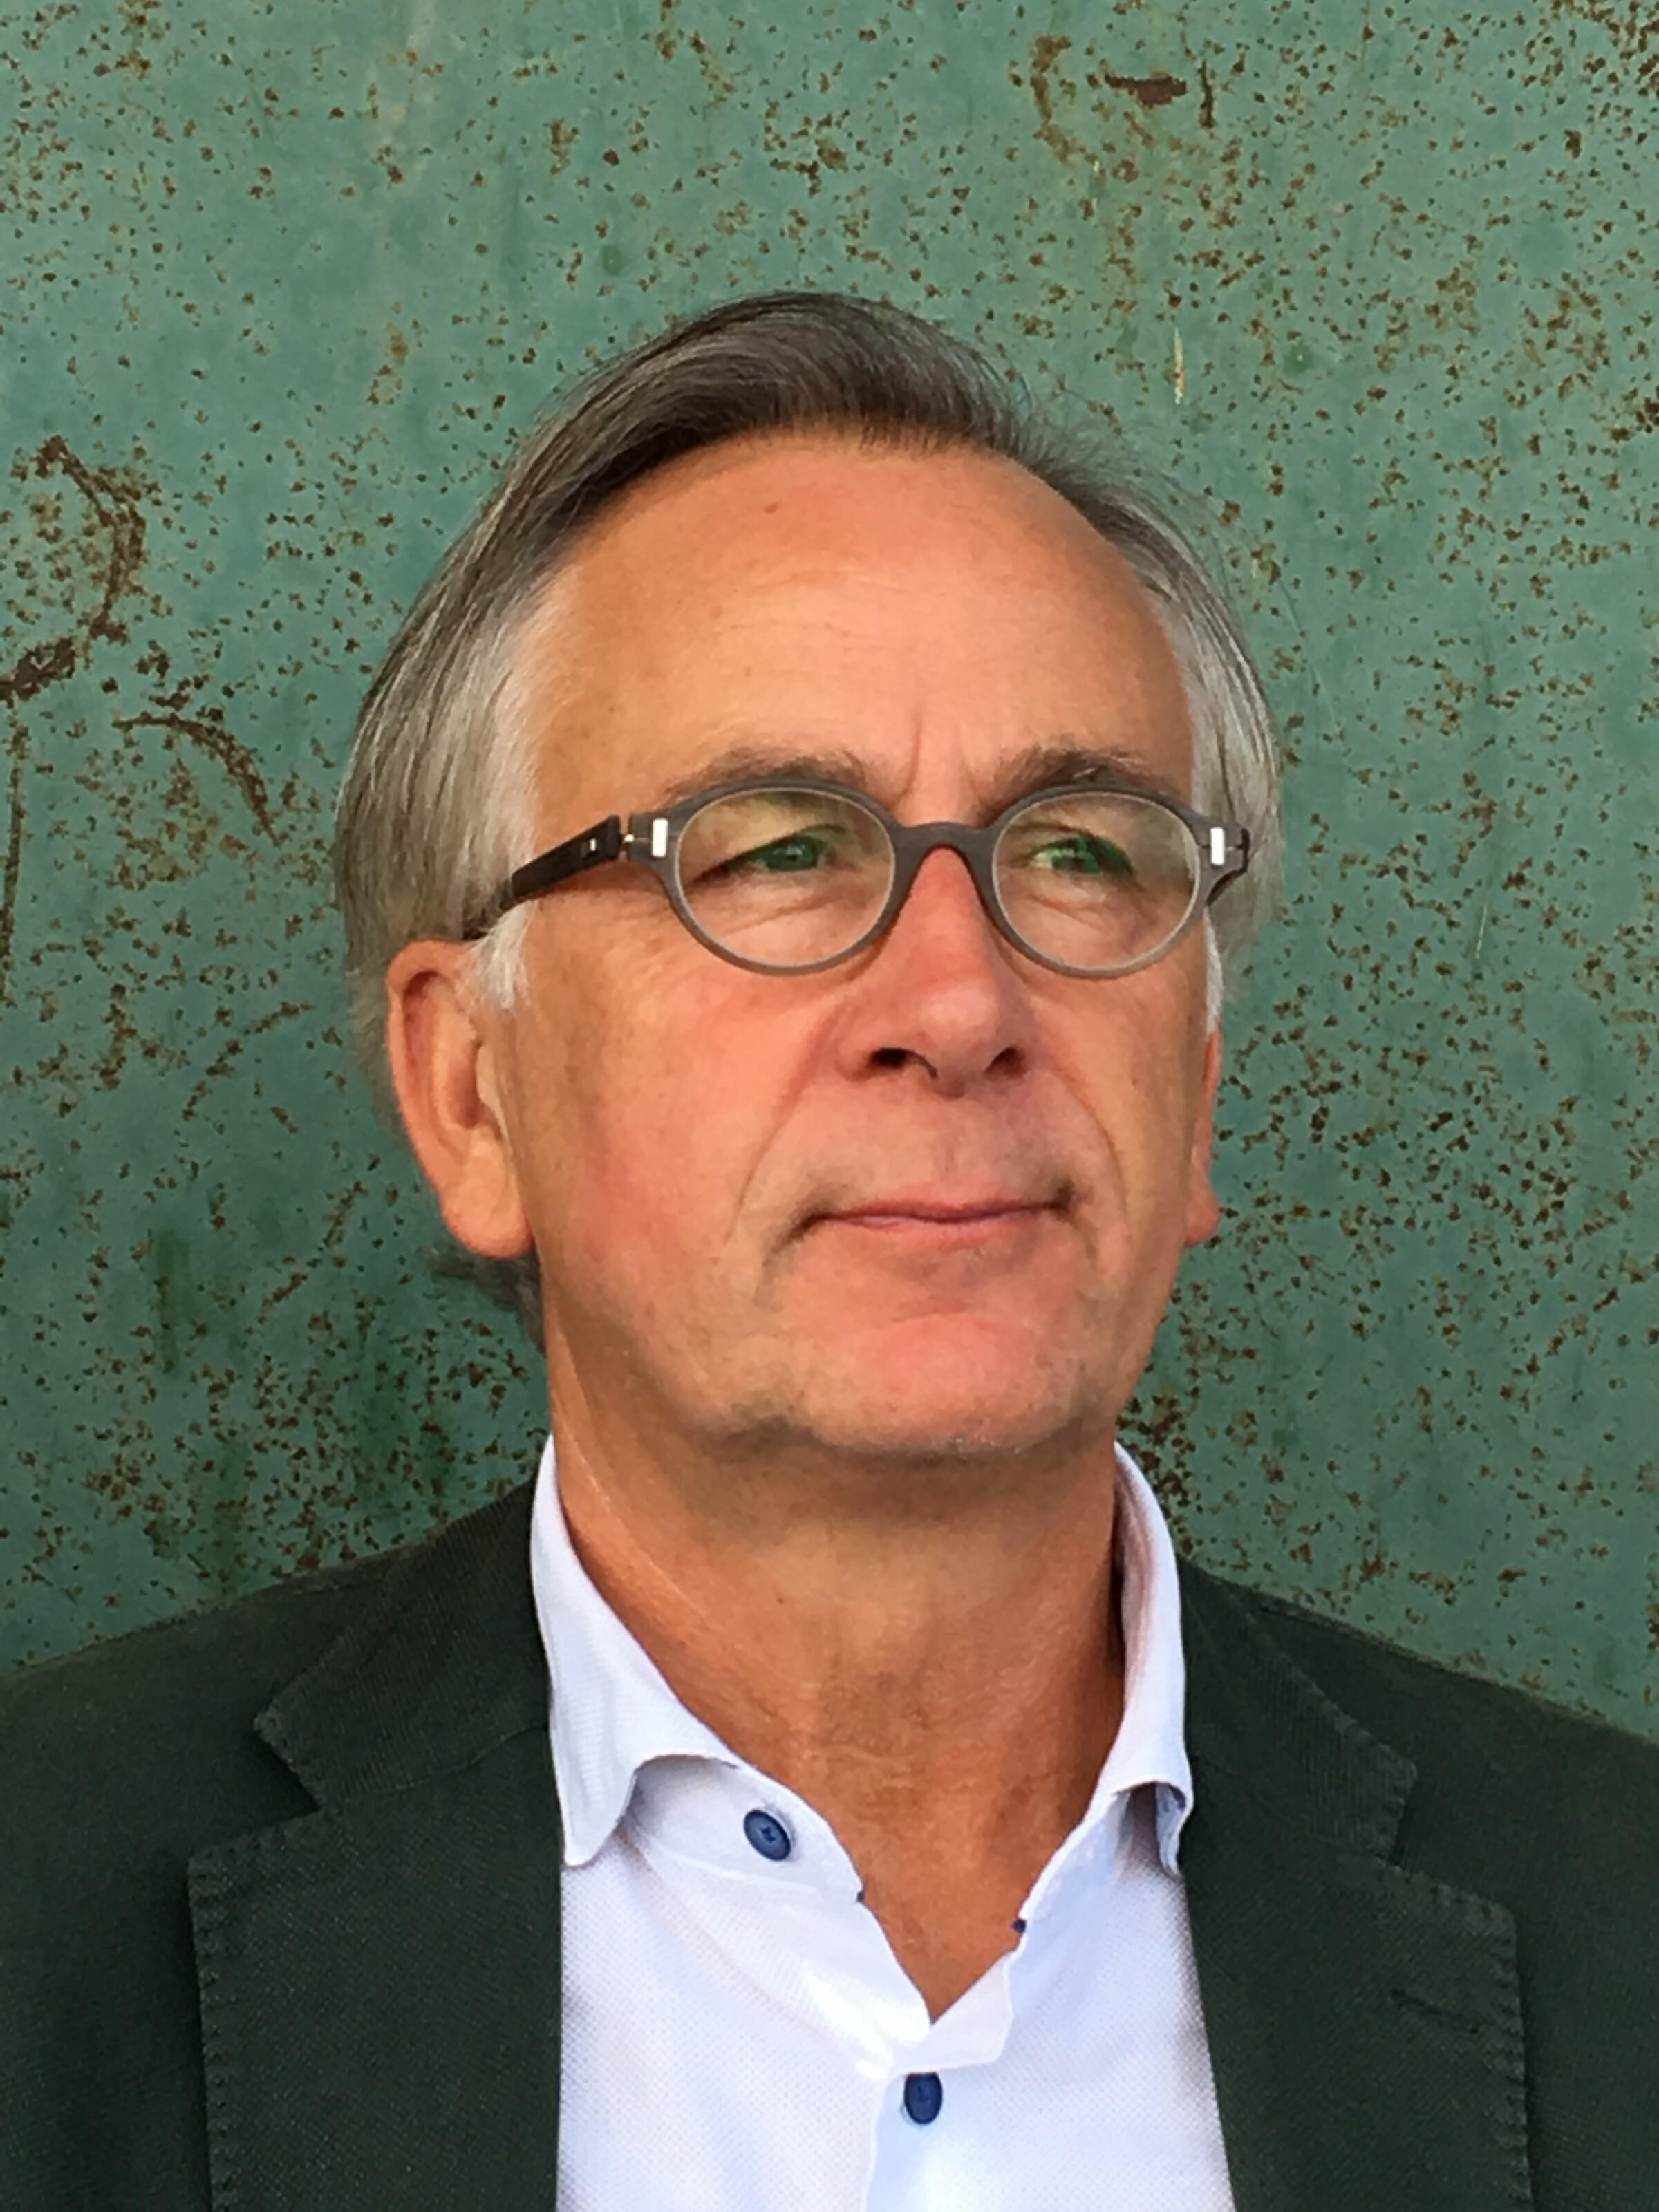 Dhr. Ir. Huub Janssen